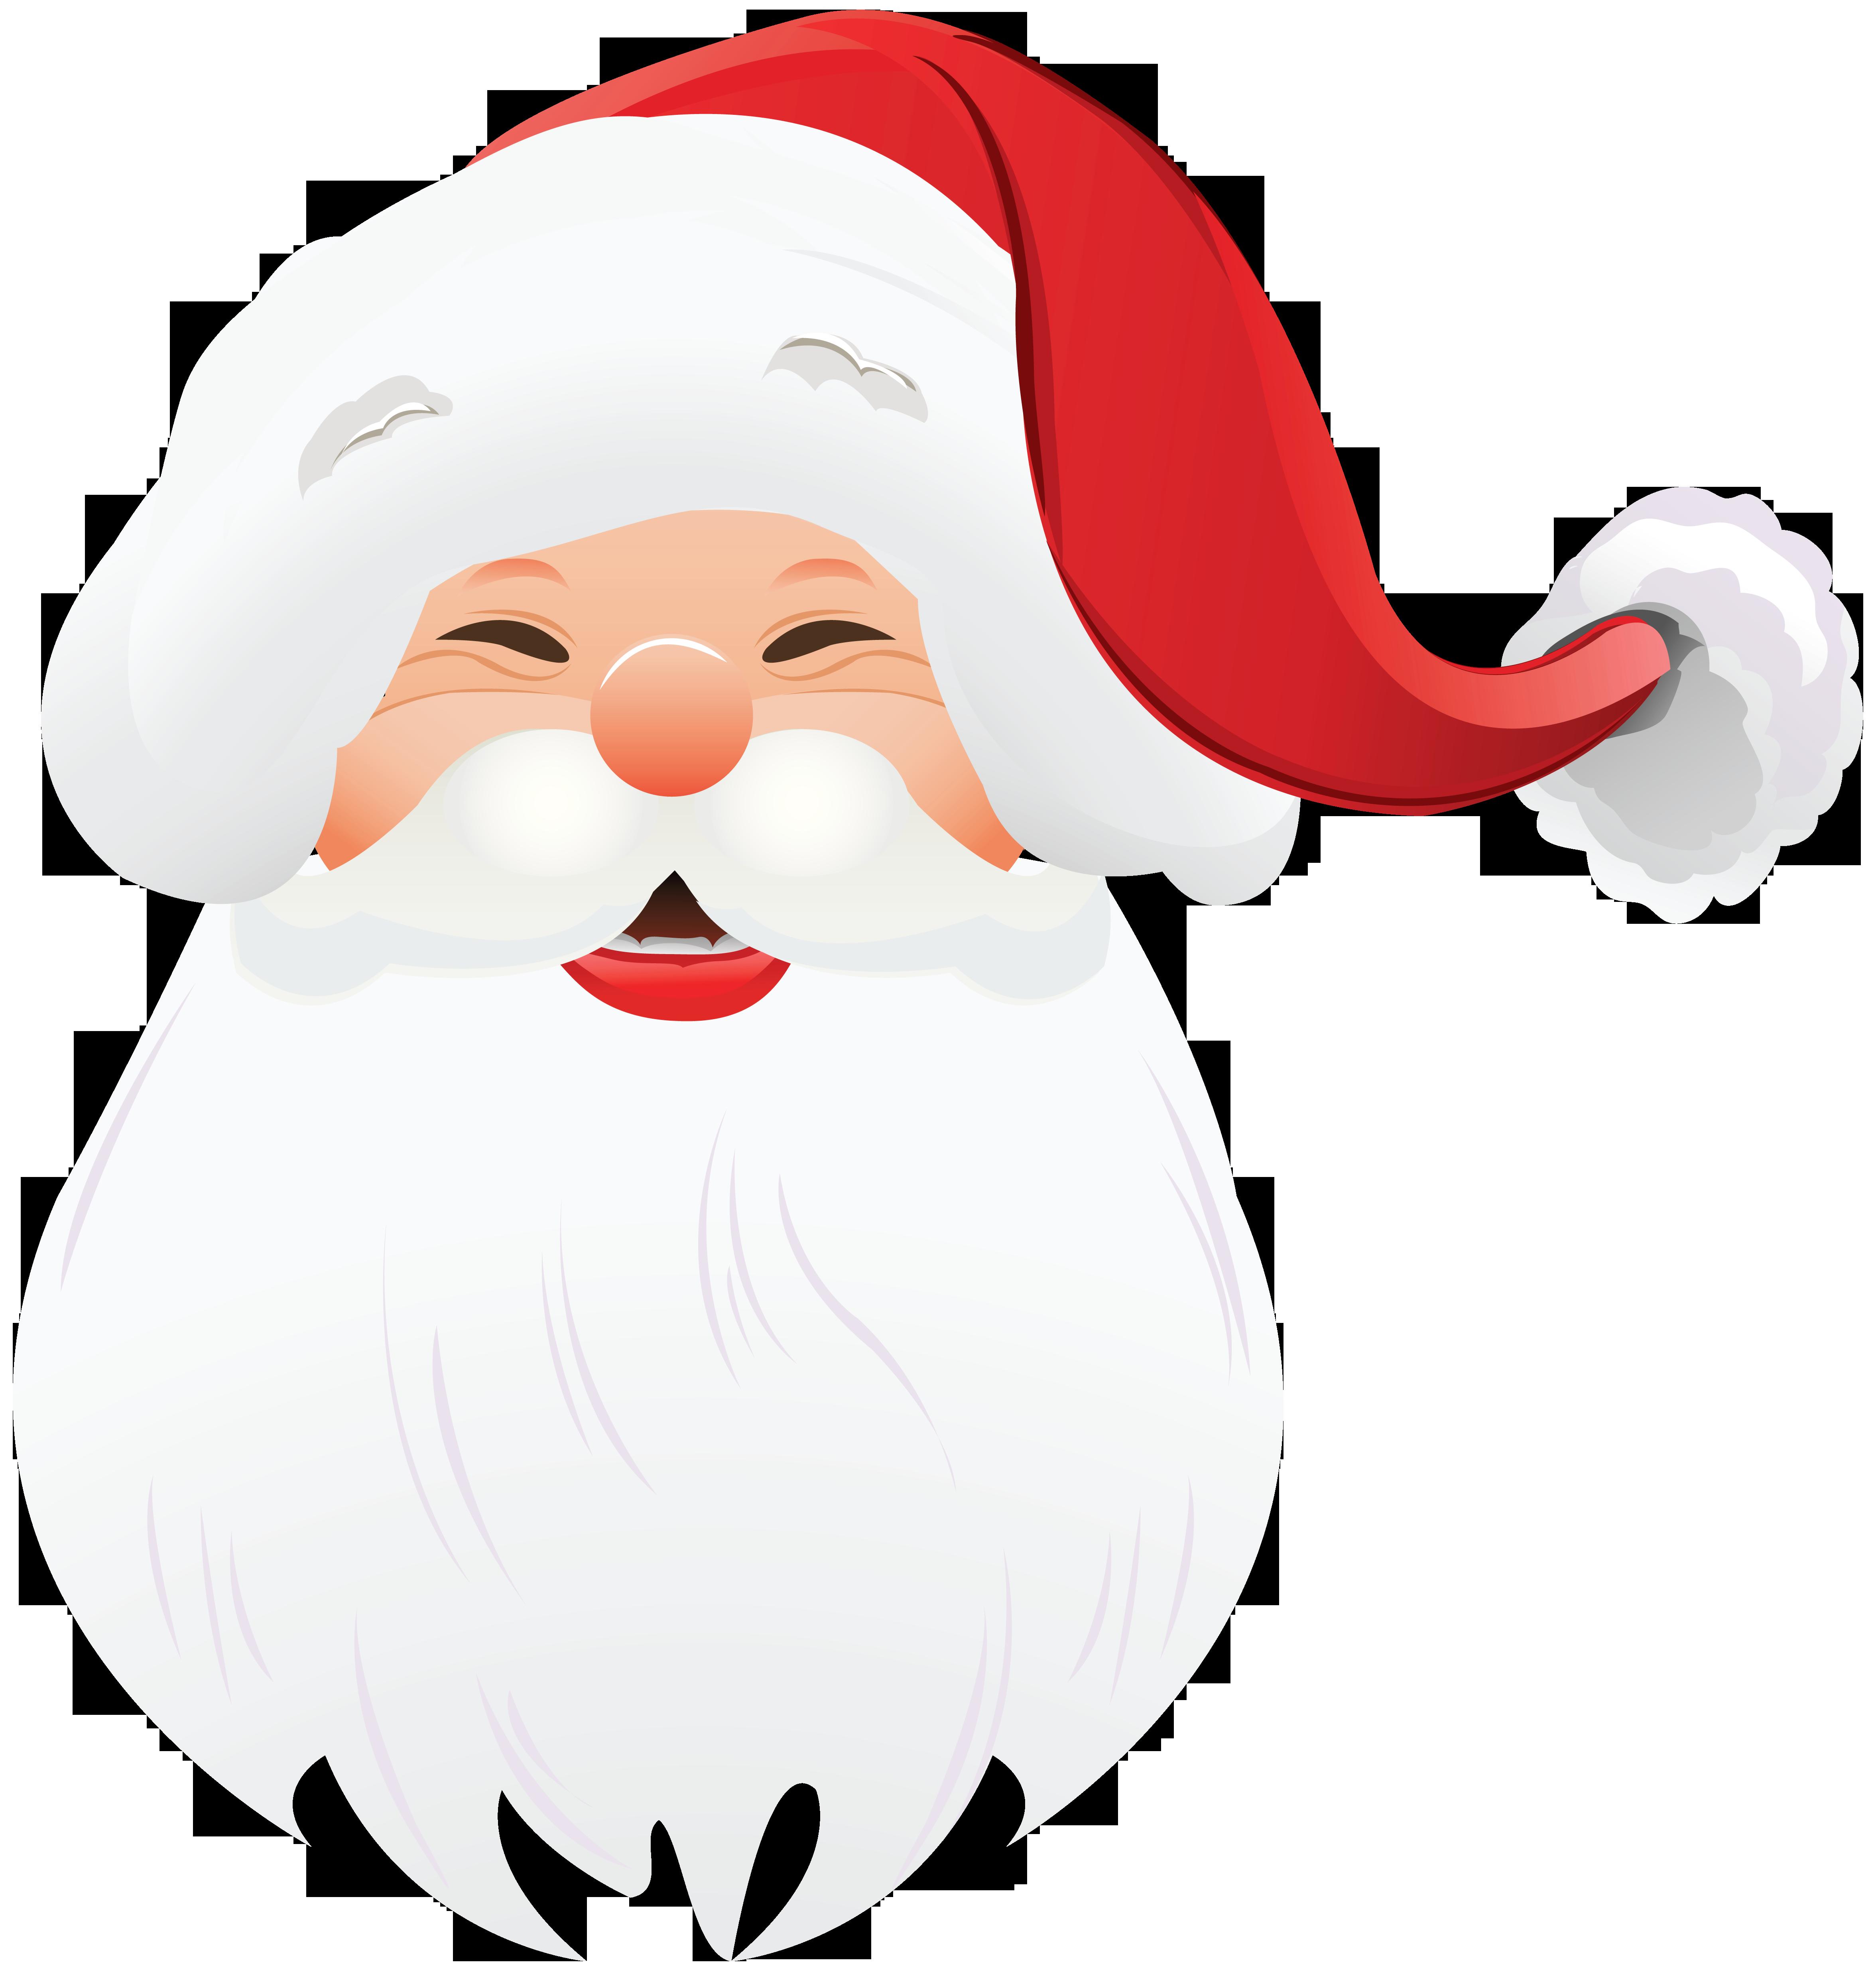 Santa face clipart clip freeuse Free Santa Face, Download Free Clip Art, Free Clip Art on ... clip freeuse